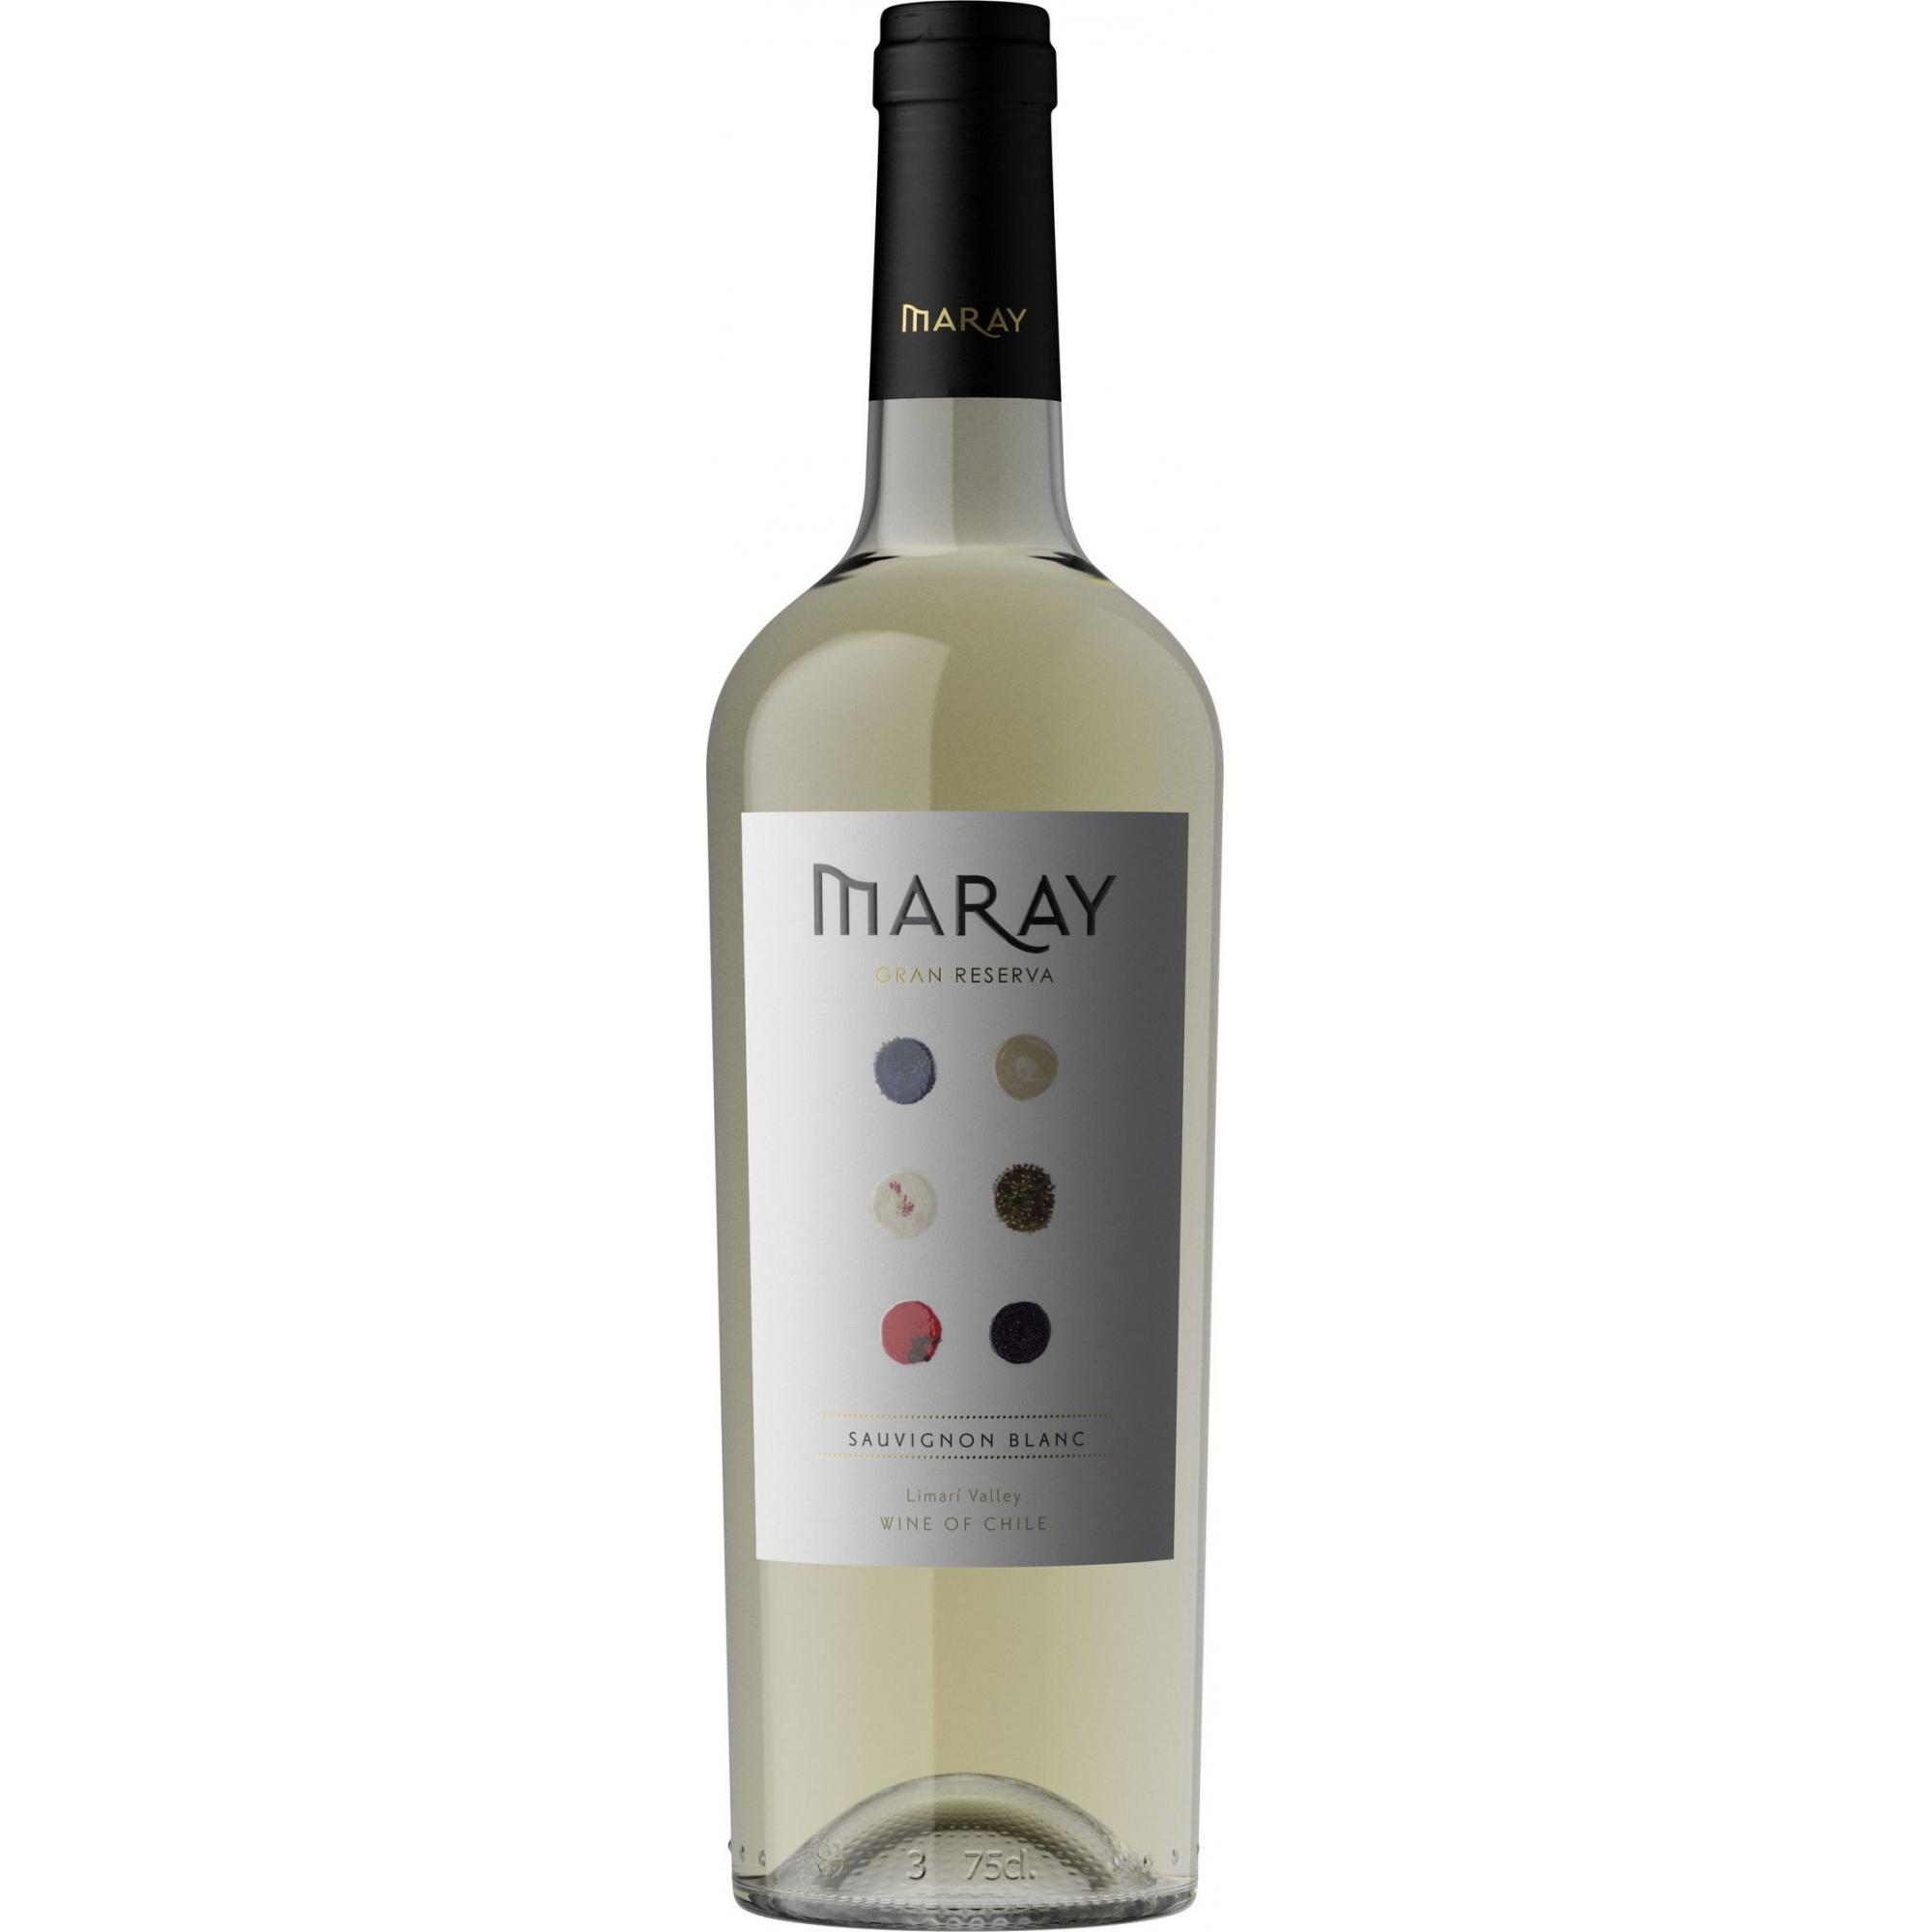 Vinho Branco Maray Gran Reserva Sauvignon Blanc 750ml